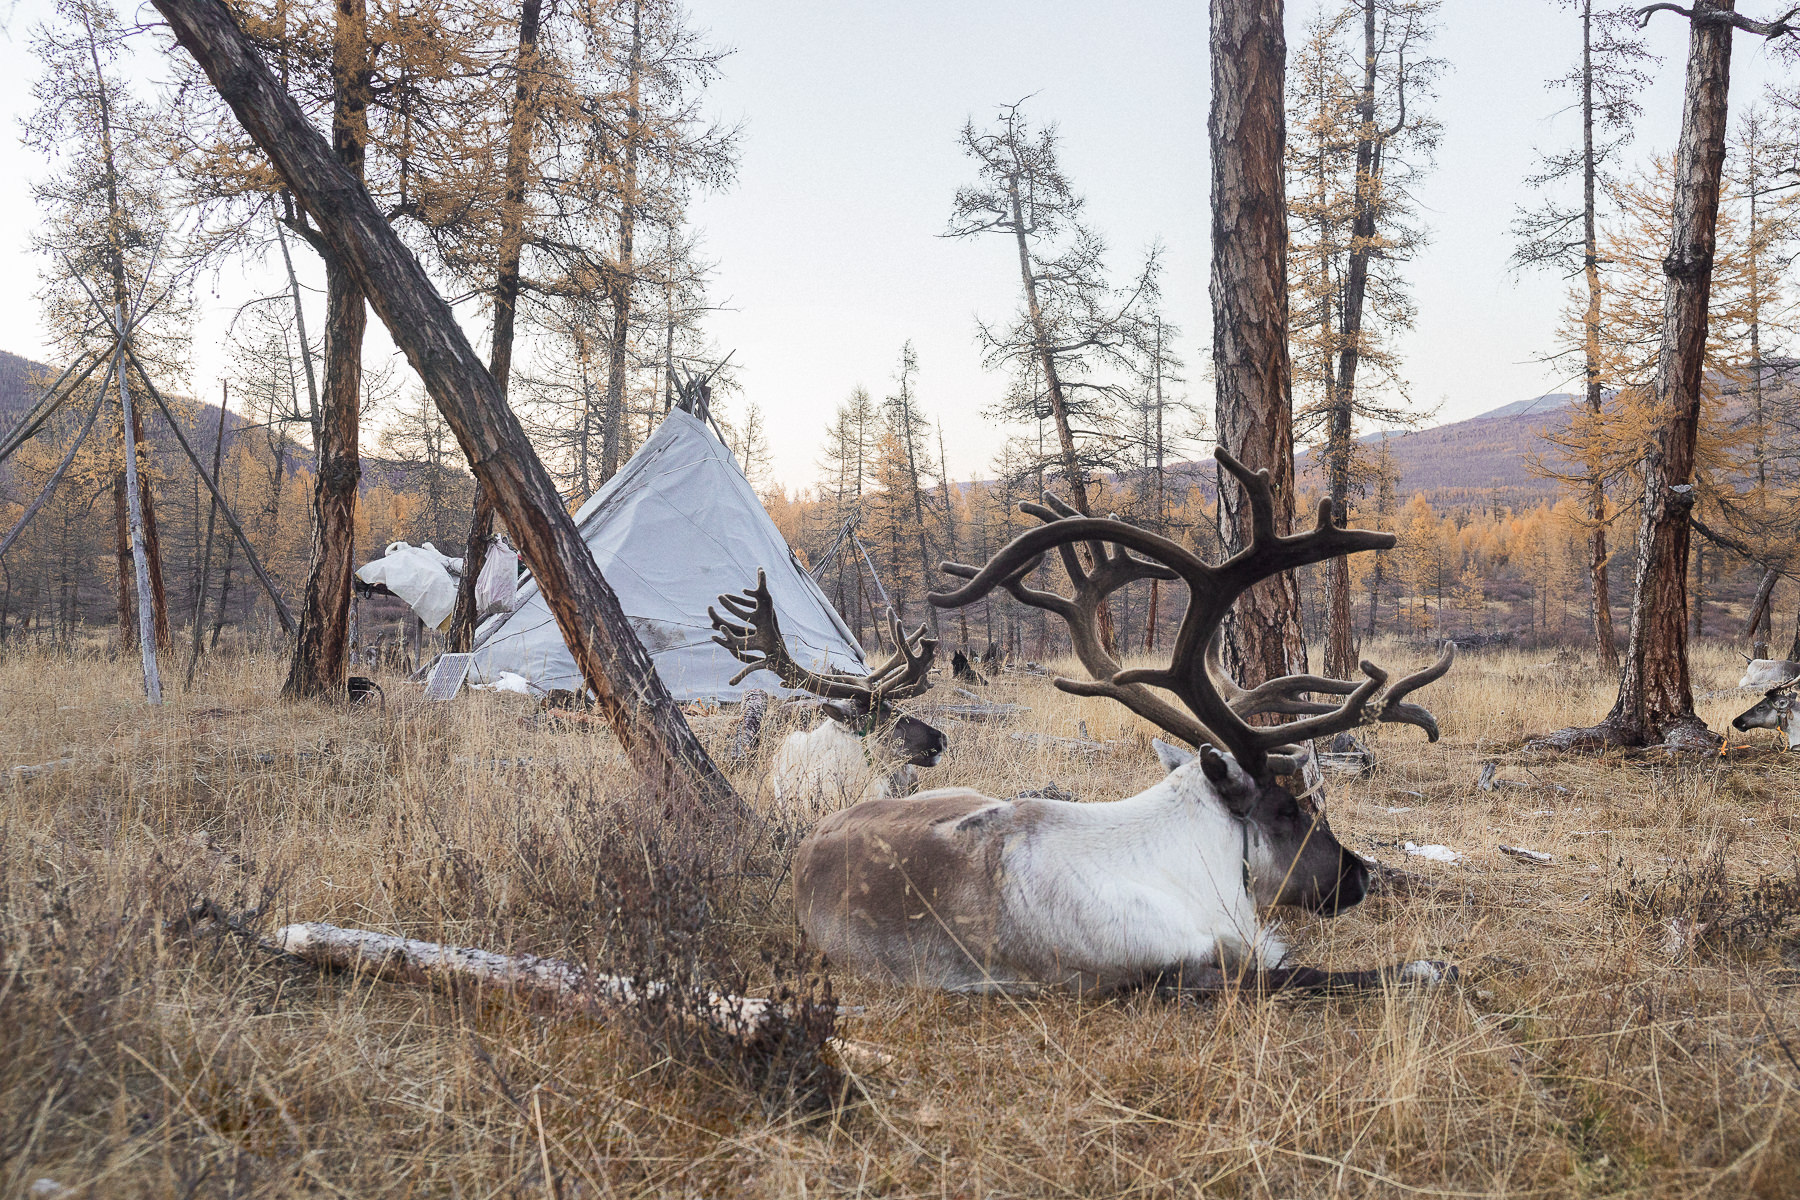 Briceportolano_Mongolia_Zaya_02_WEB.jpg